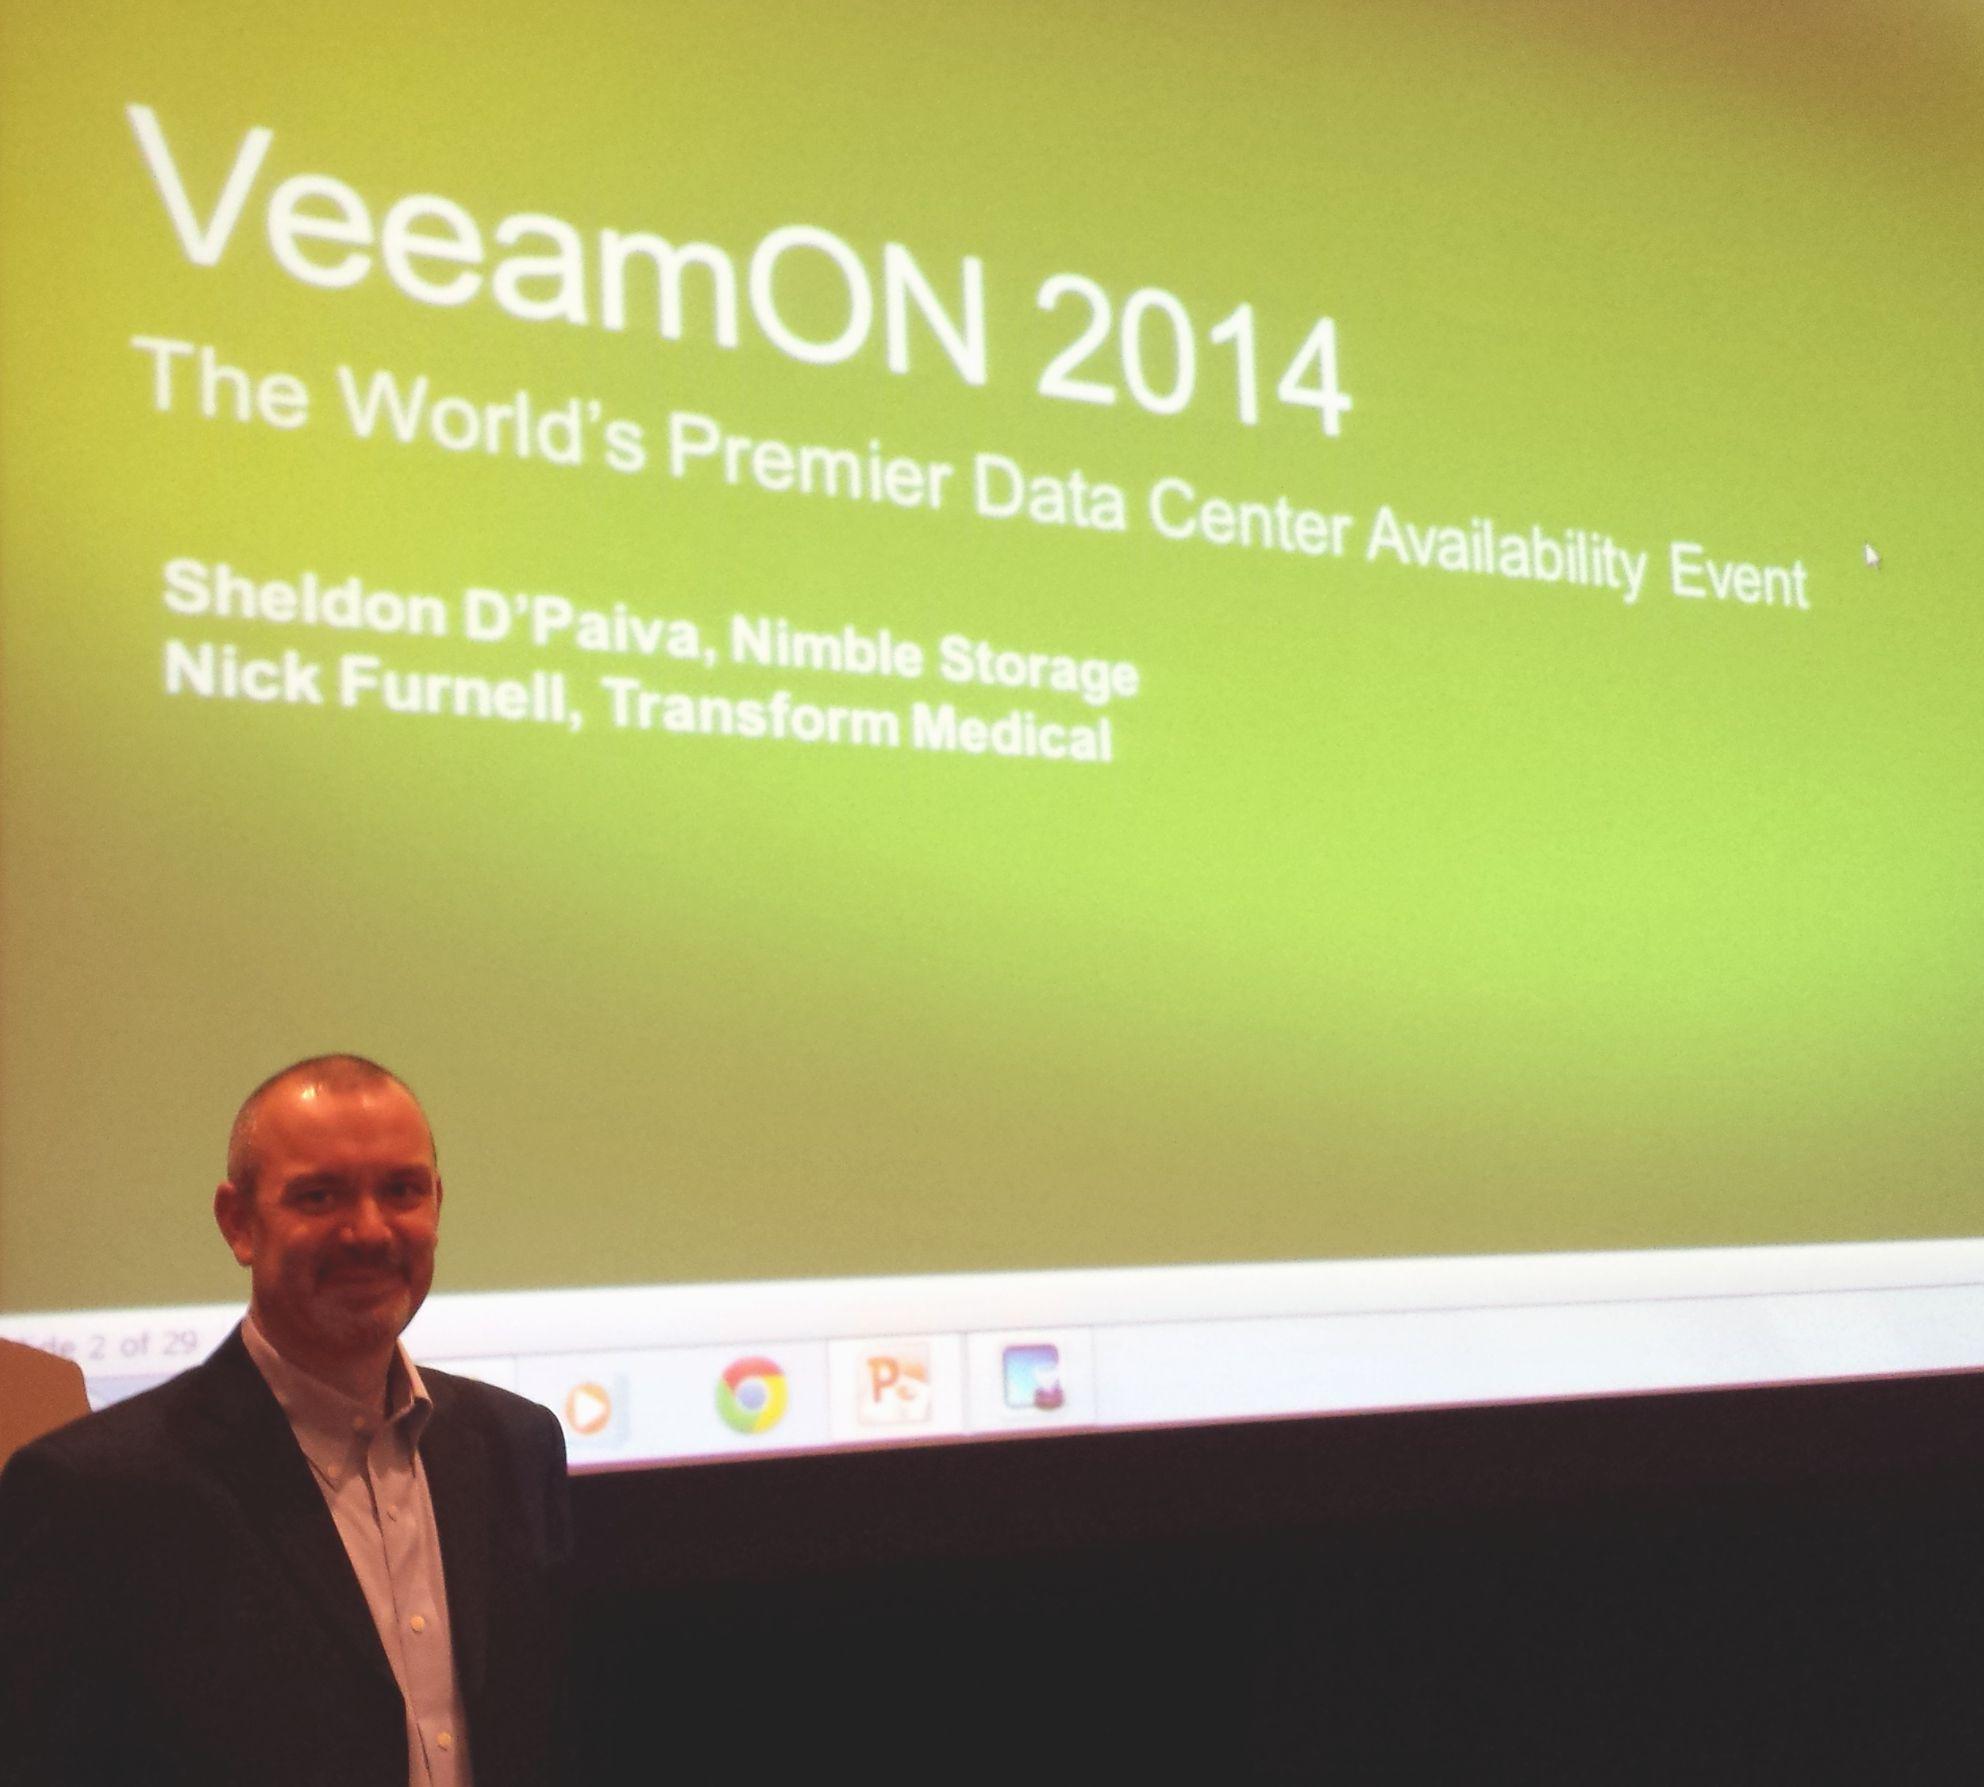 Vegas-Presentation-3 VeeamOn 2014 Presentation with Nimble Storage